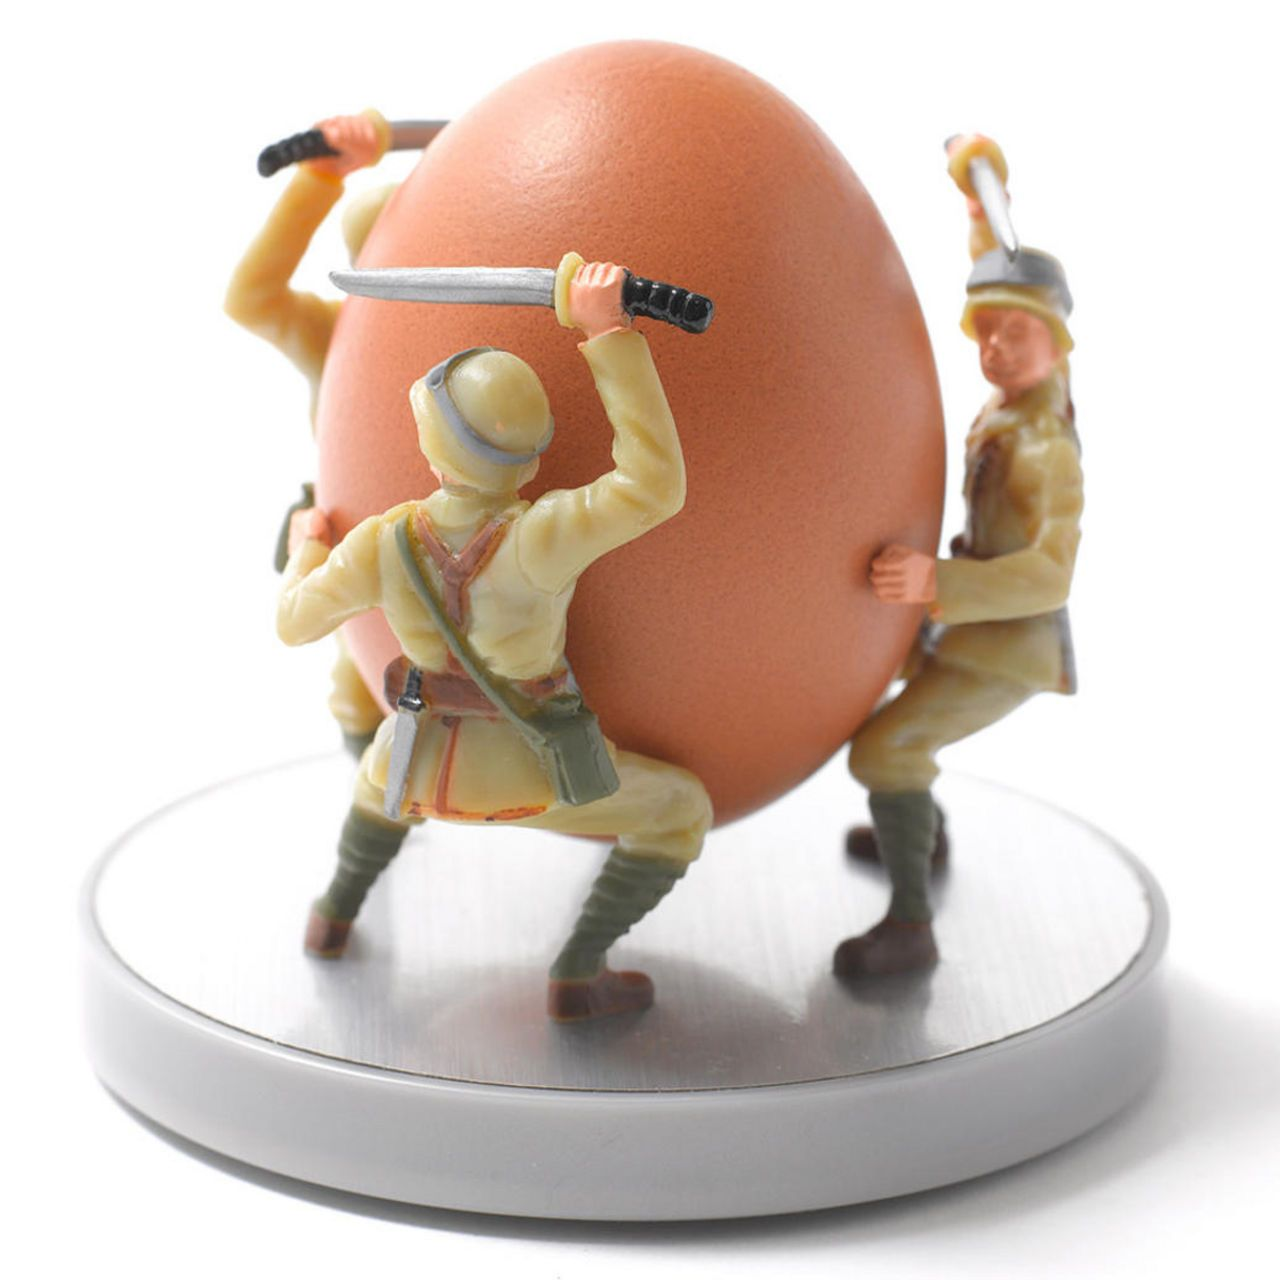 Half Boiled Egg...mmmm...yum yum! | Food \u0026 Drinks | Pinterest ...